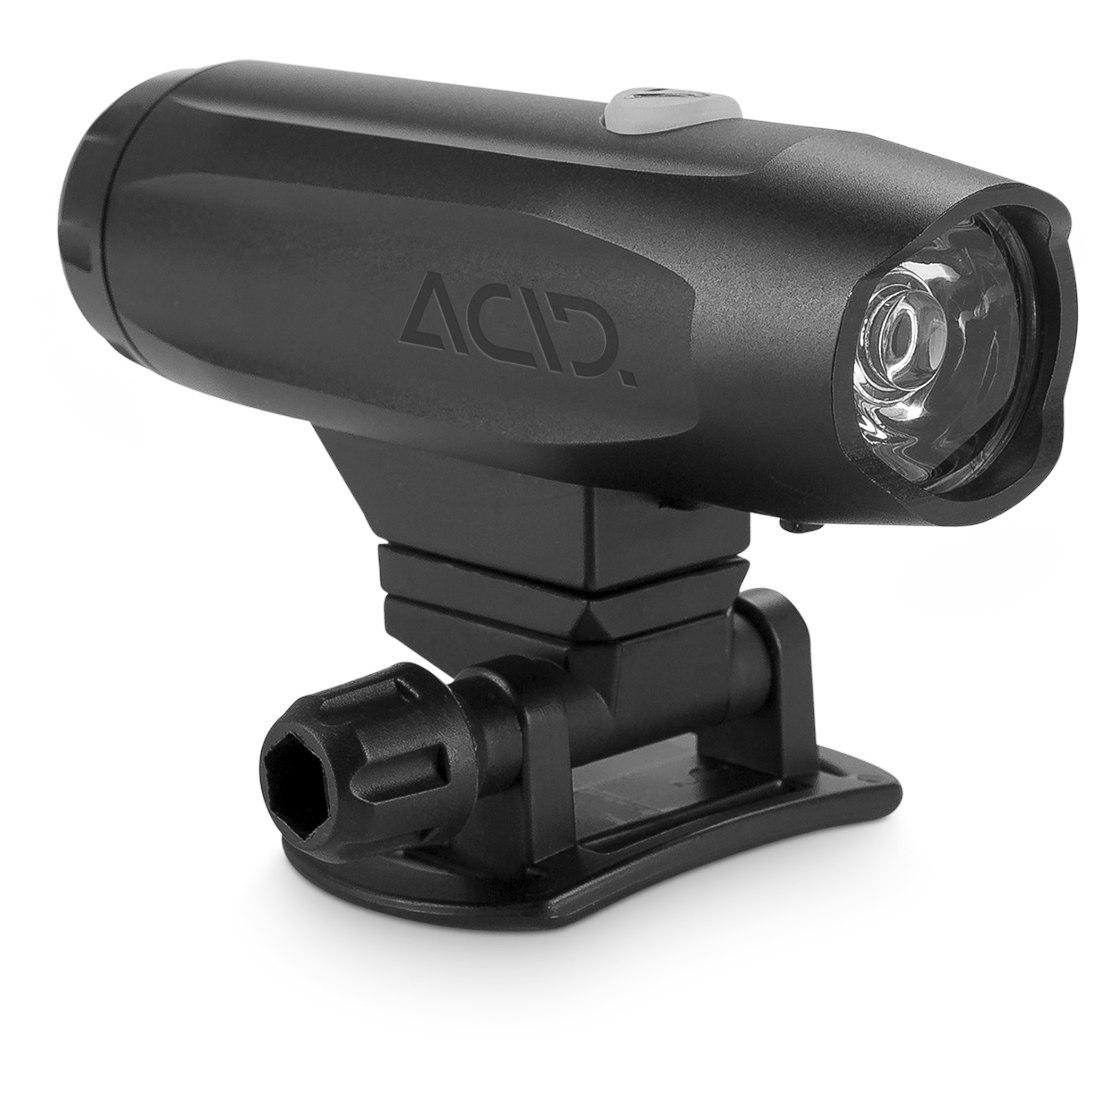 CUBE ACID Outdoor LED Light HPA 850 - black